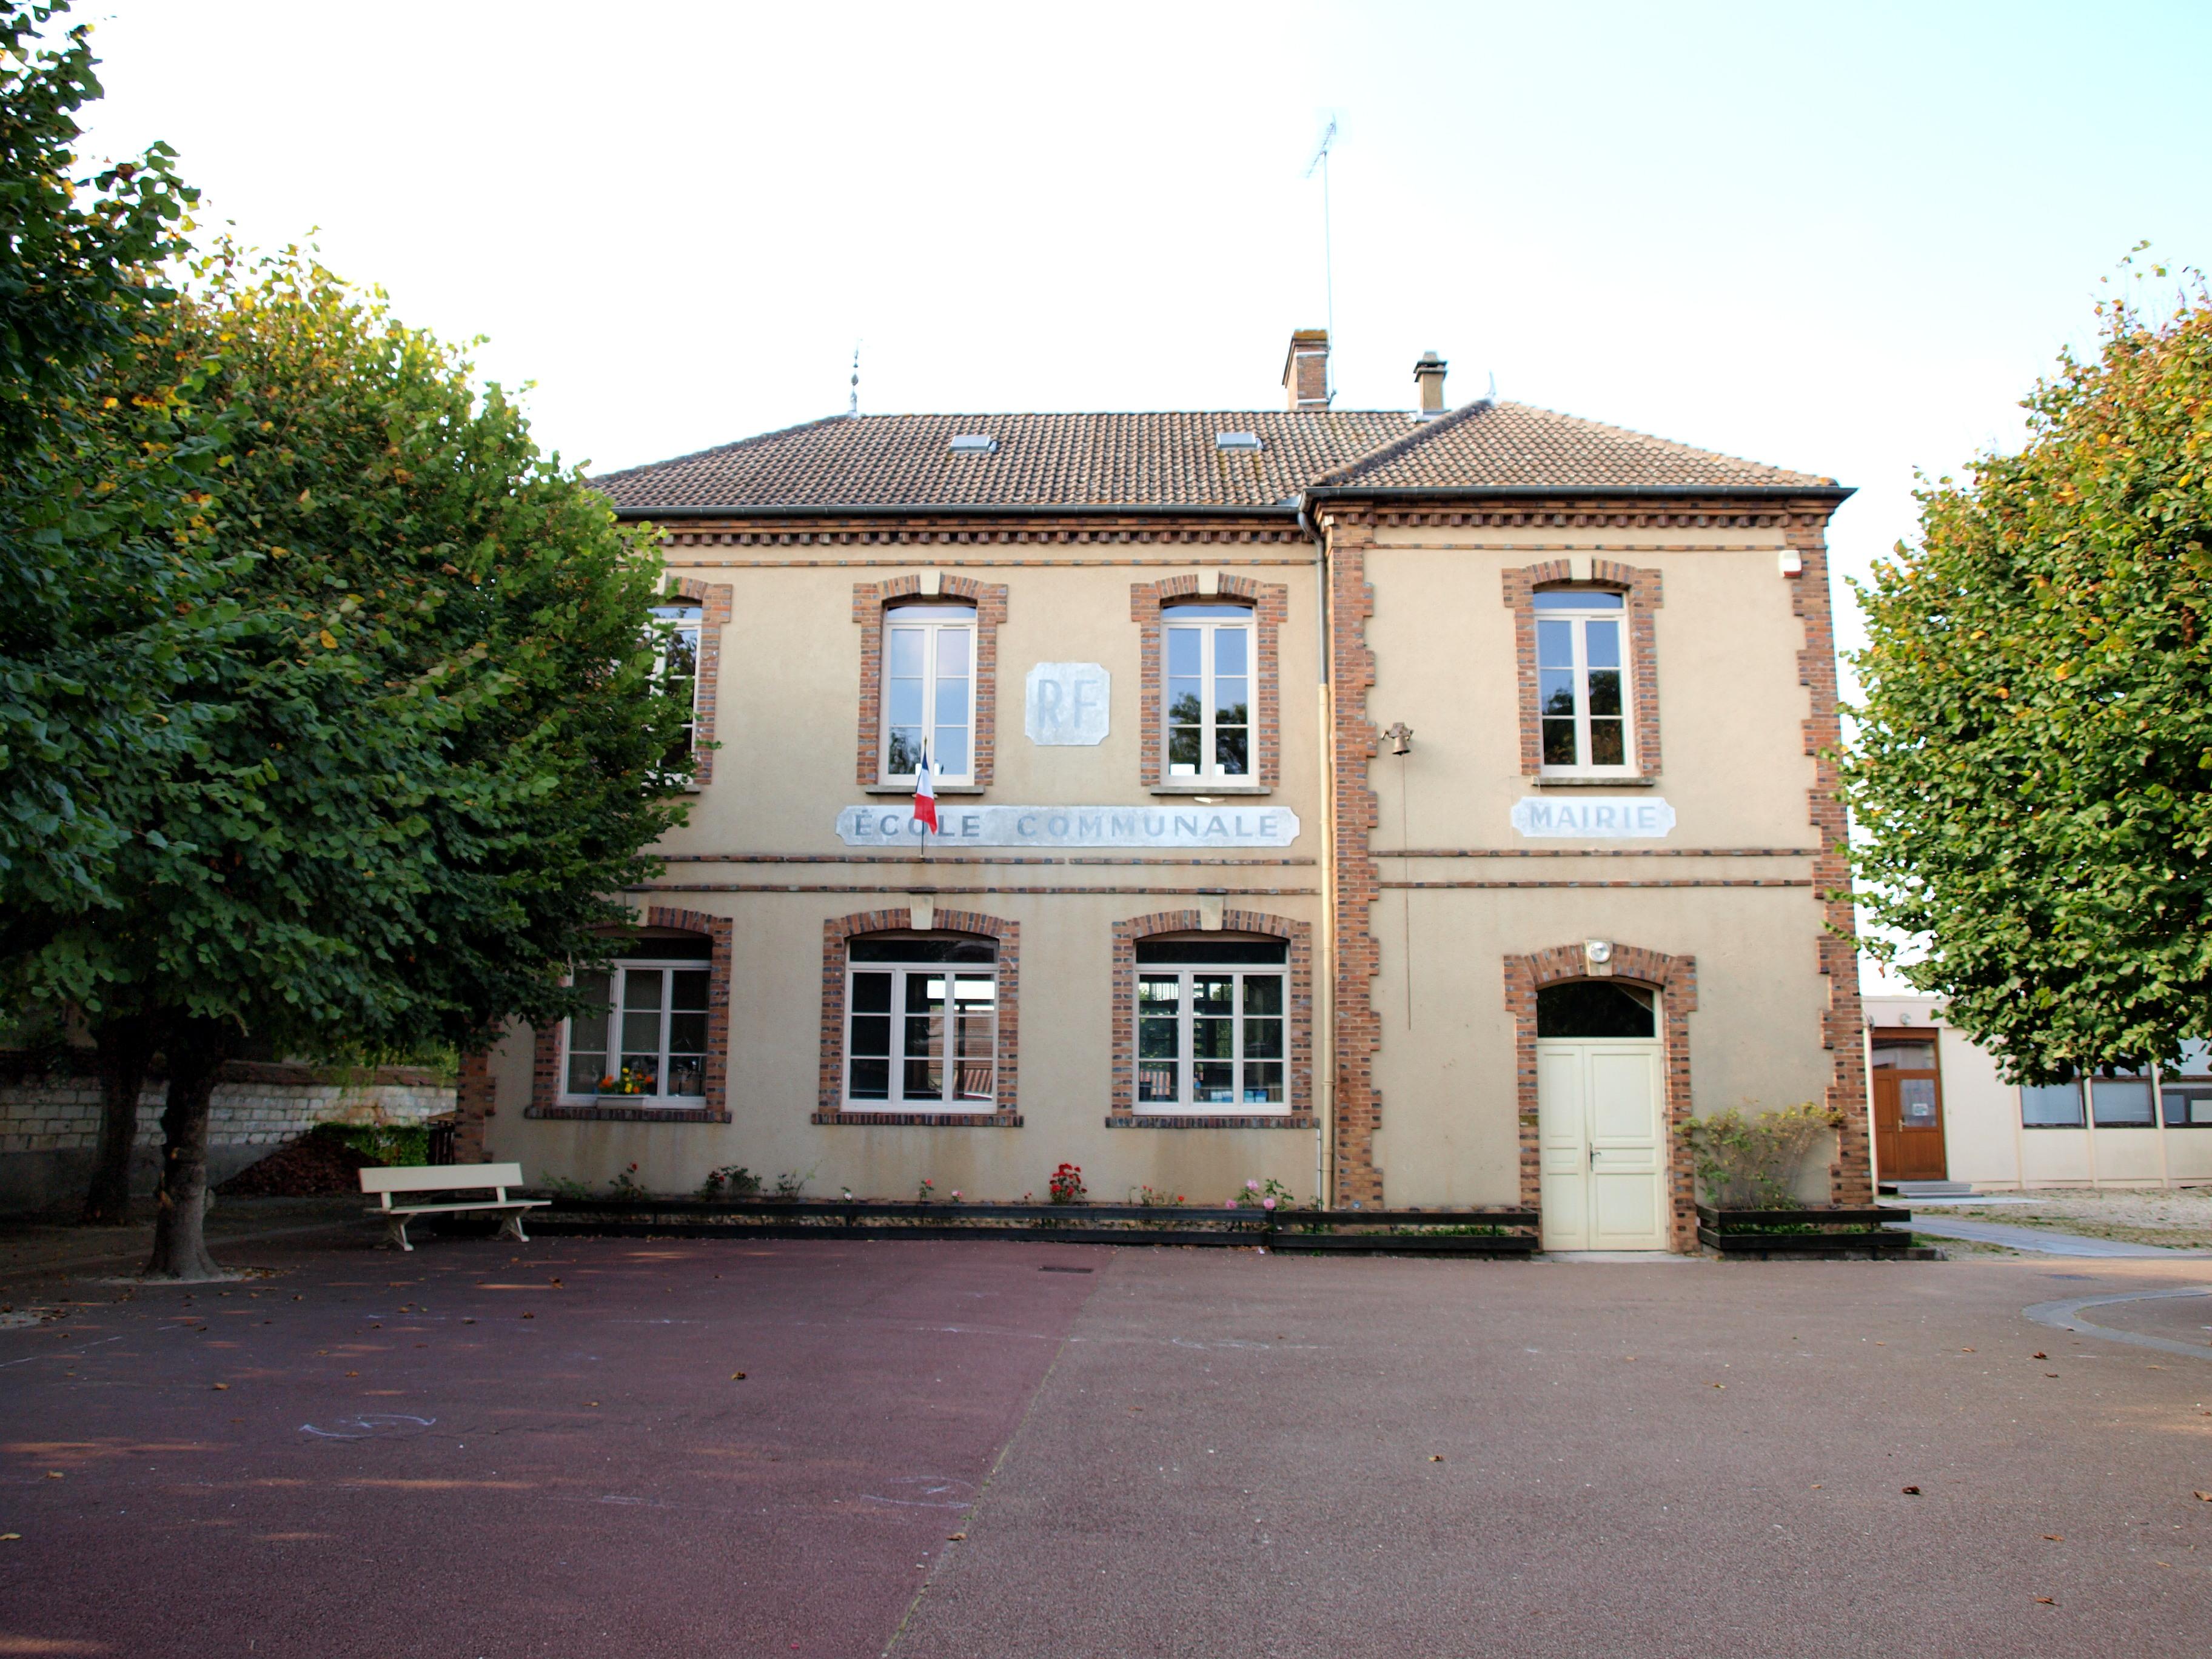 Theil-sur-Vanne